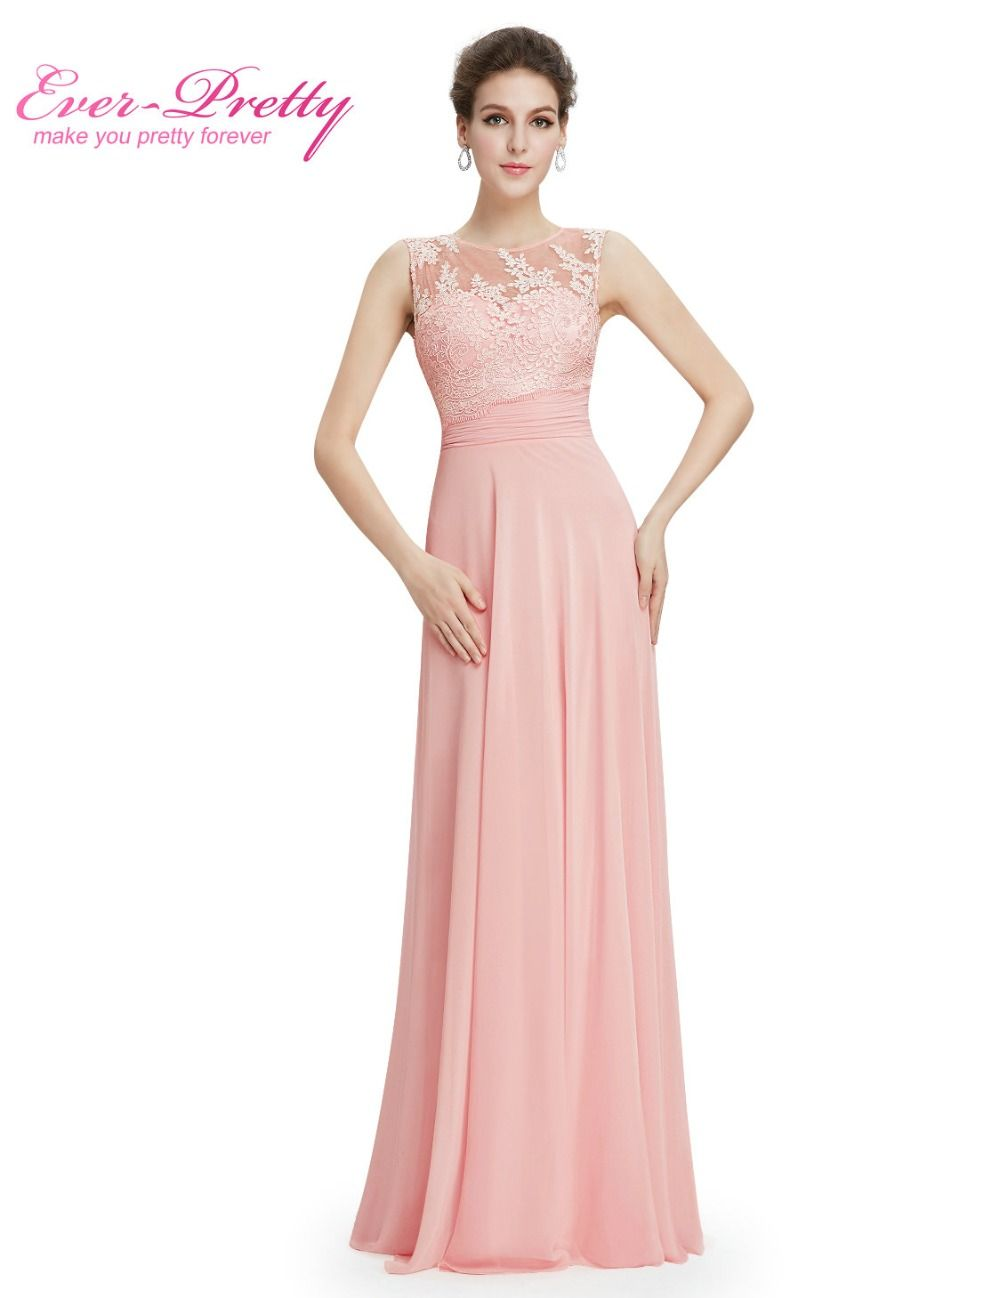 Elegant light pink chiffon long bridesmaid dresses ep08760 2017 elegant light pink chiffon long bridesmaid dresses ep08760 2017 vestido formal dress floor length sleeveless bridesmaid ombrellifo Gallery